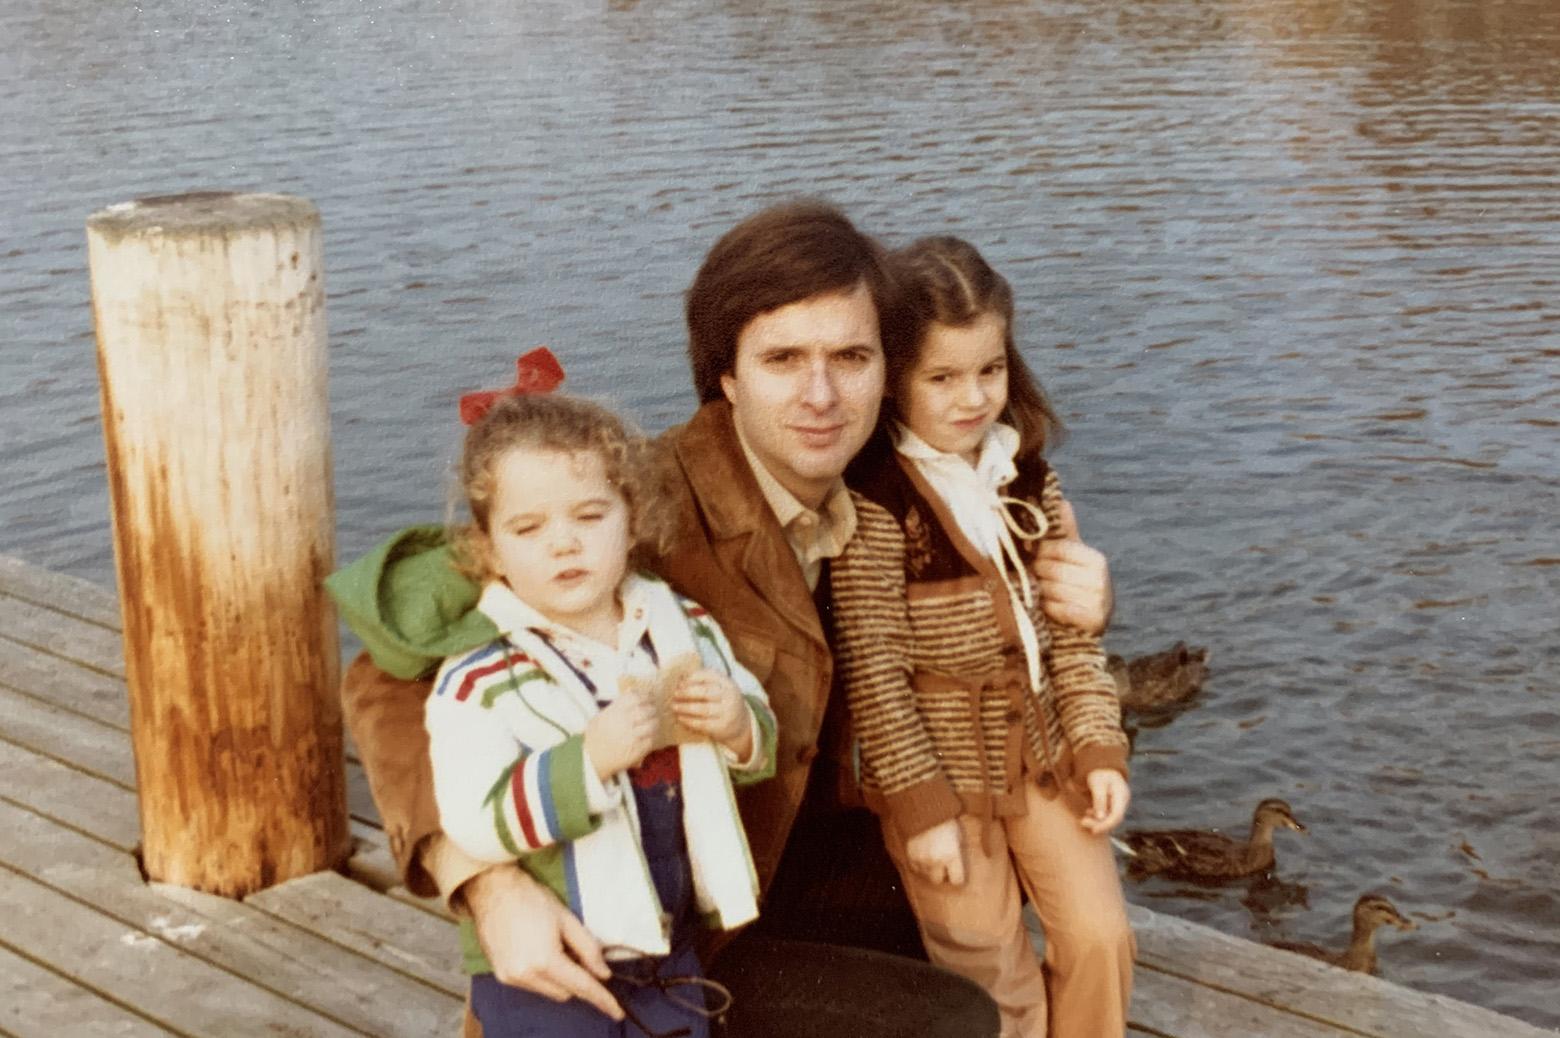 Nikolaos Katopodes with his daughters